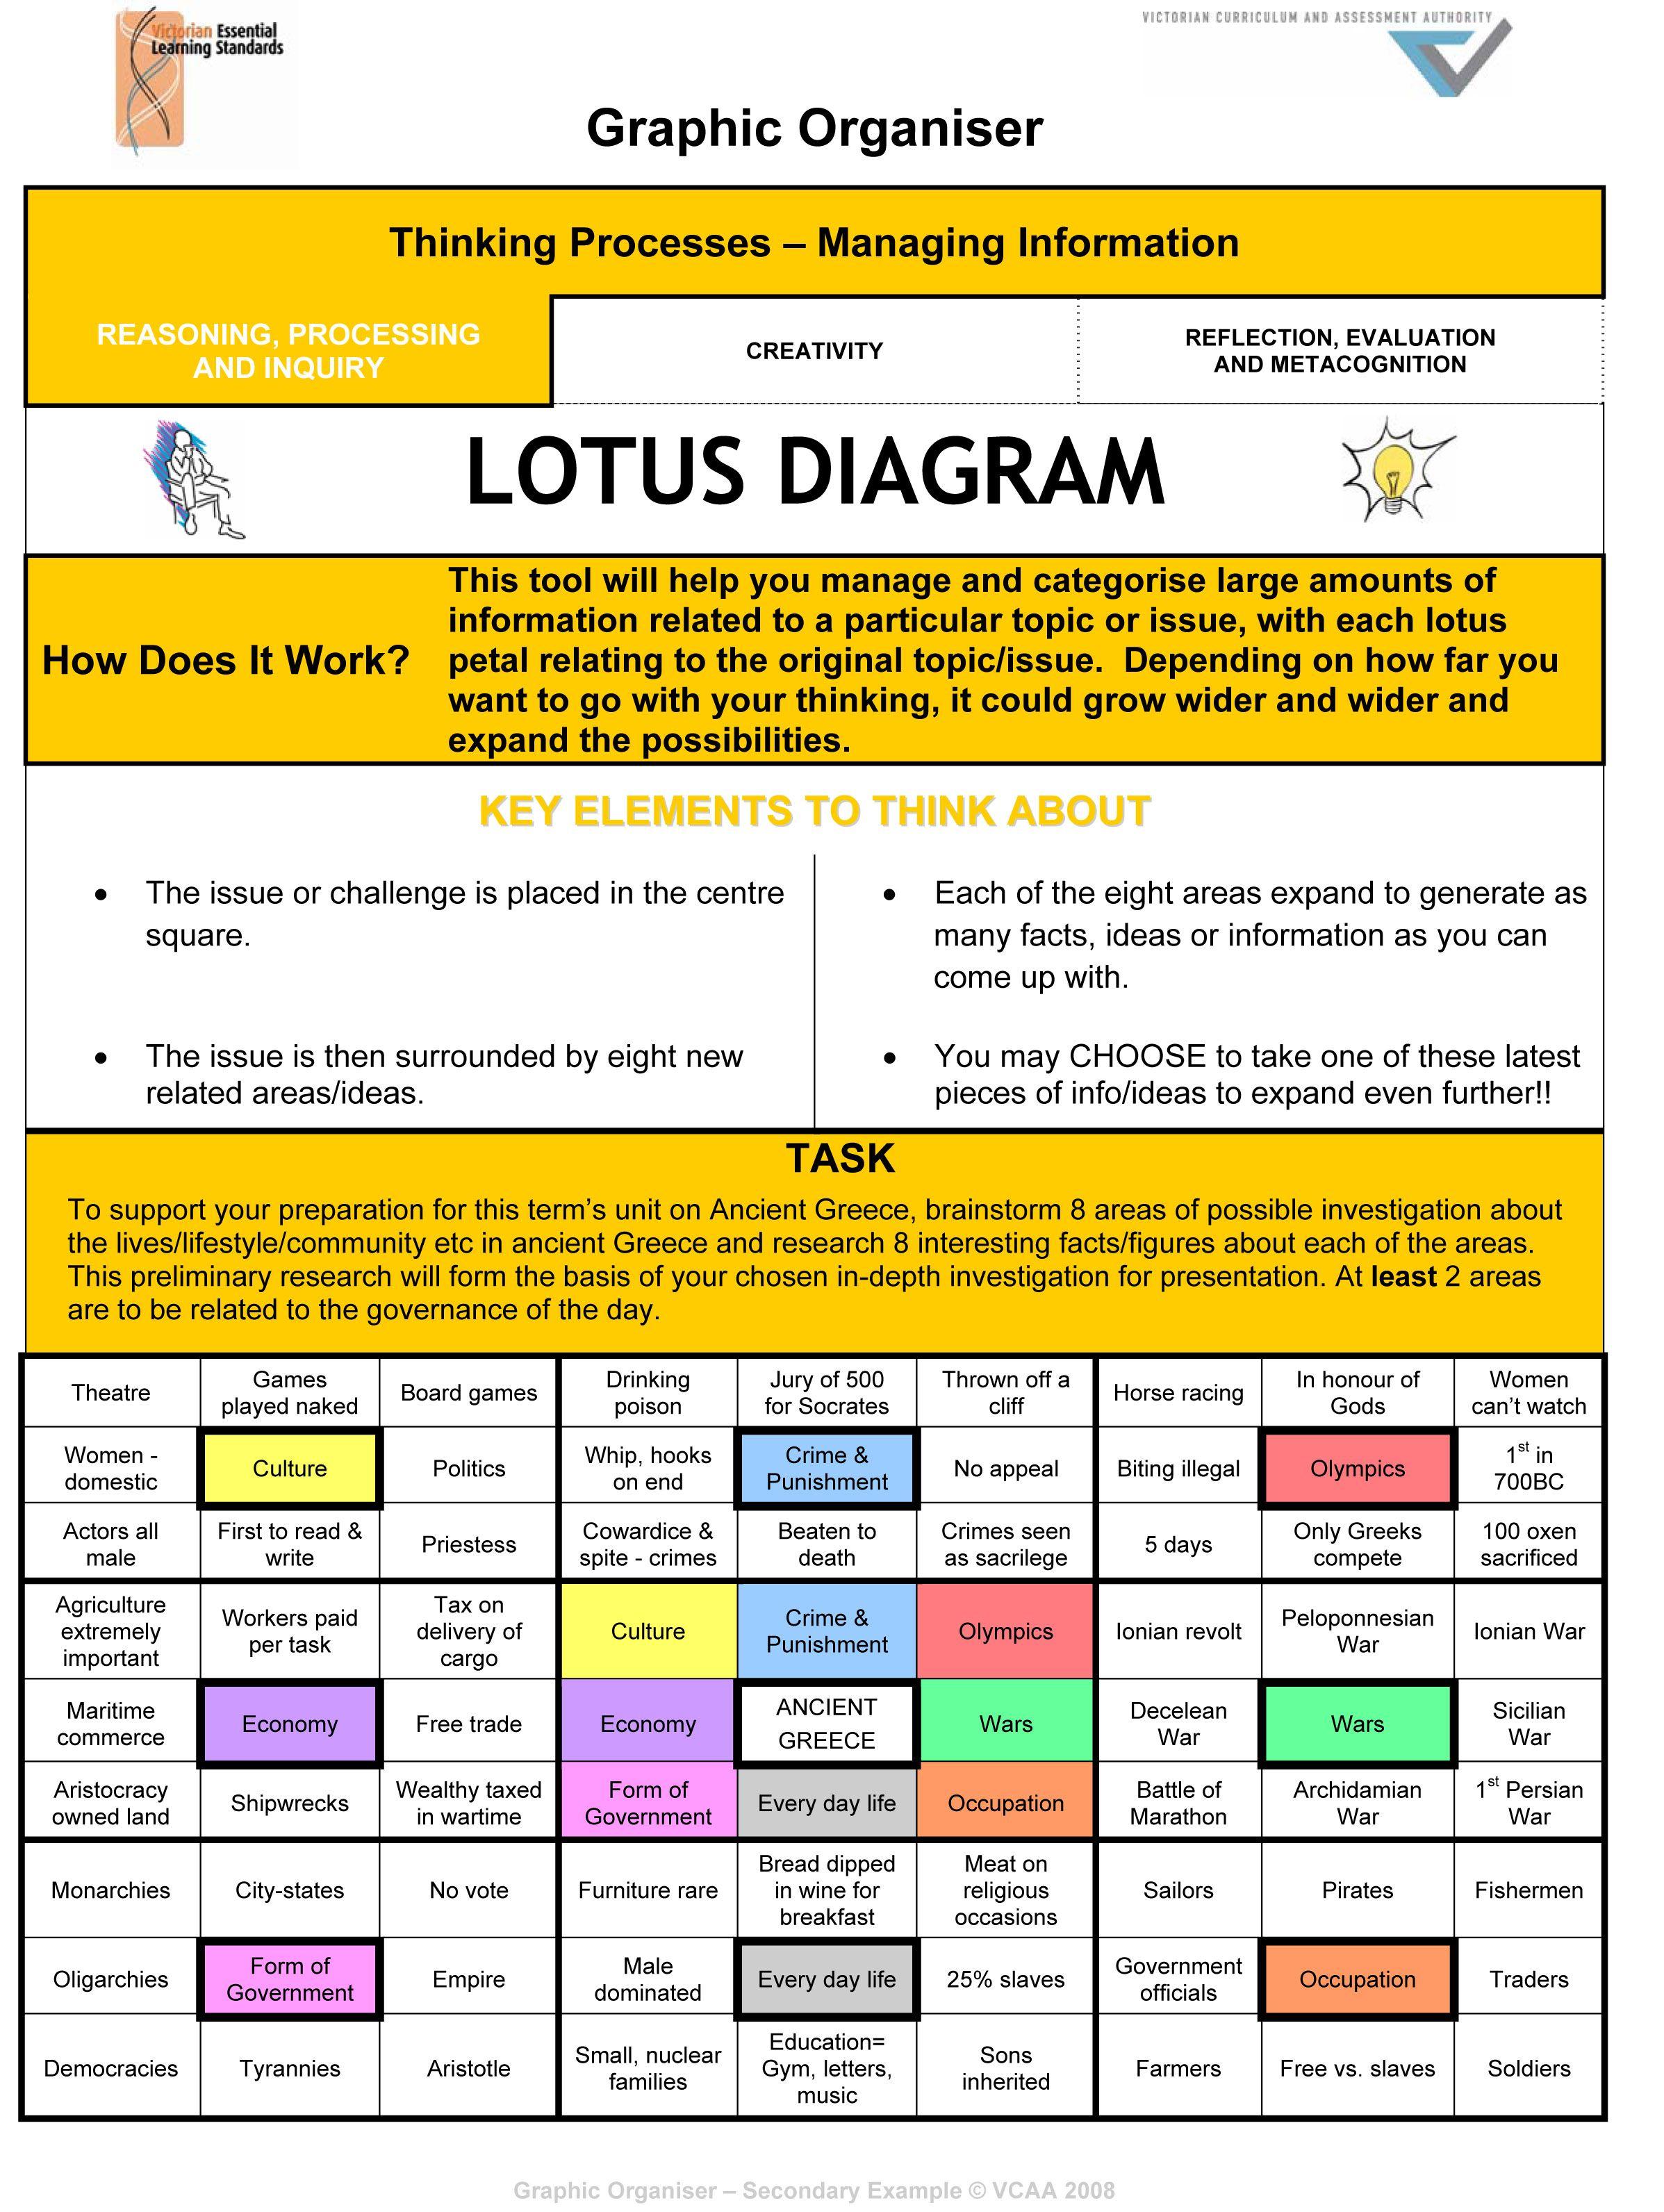 Lotus Digram Example Graphic Organiser Lotus Diagram What Is A Lotus Diagram This Analytical Graphic Organizers Graphic Organisers Creative Thinking Skills